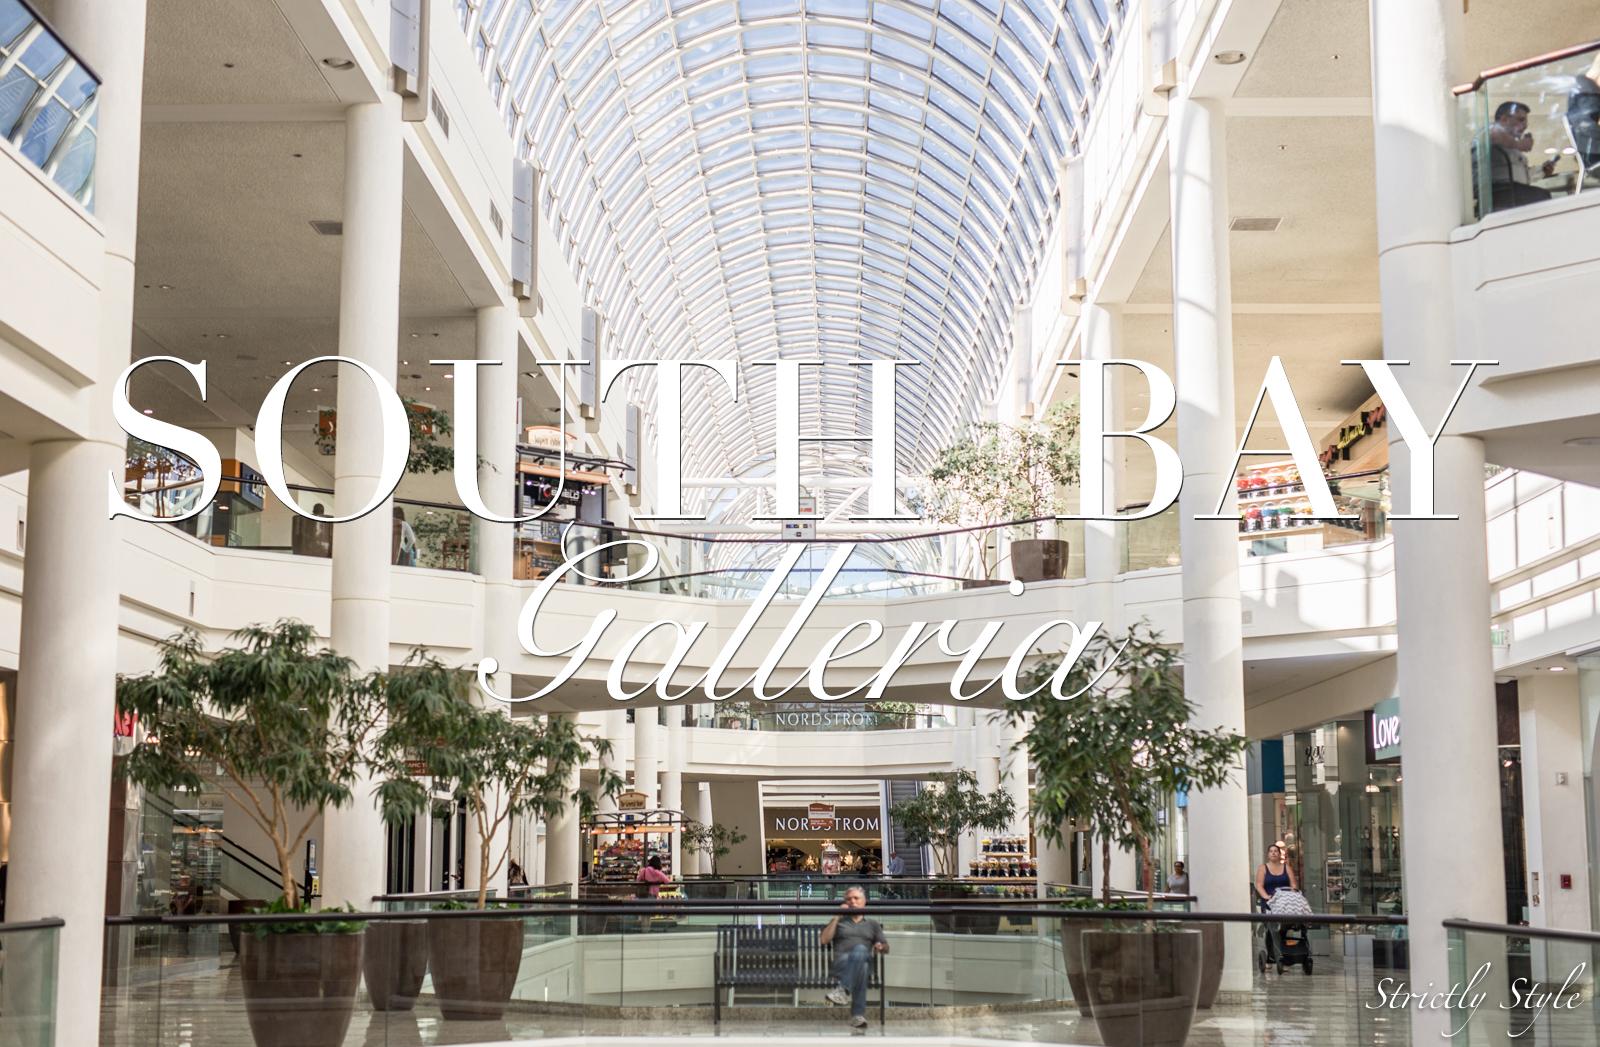 south bay galleria-9208 copytext